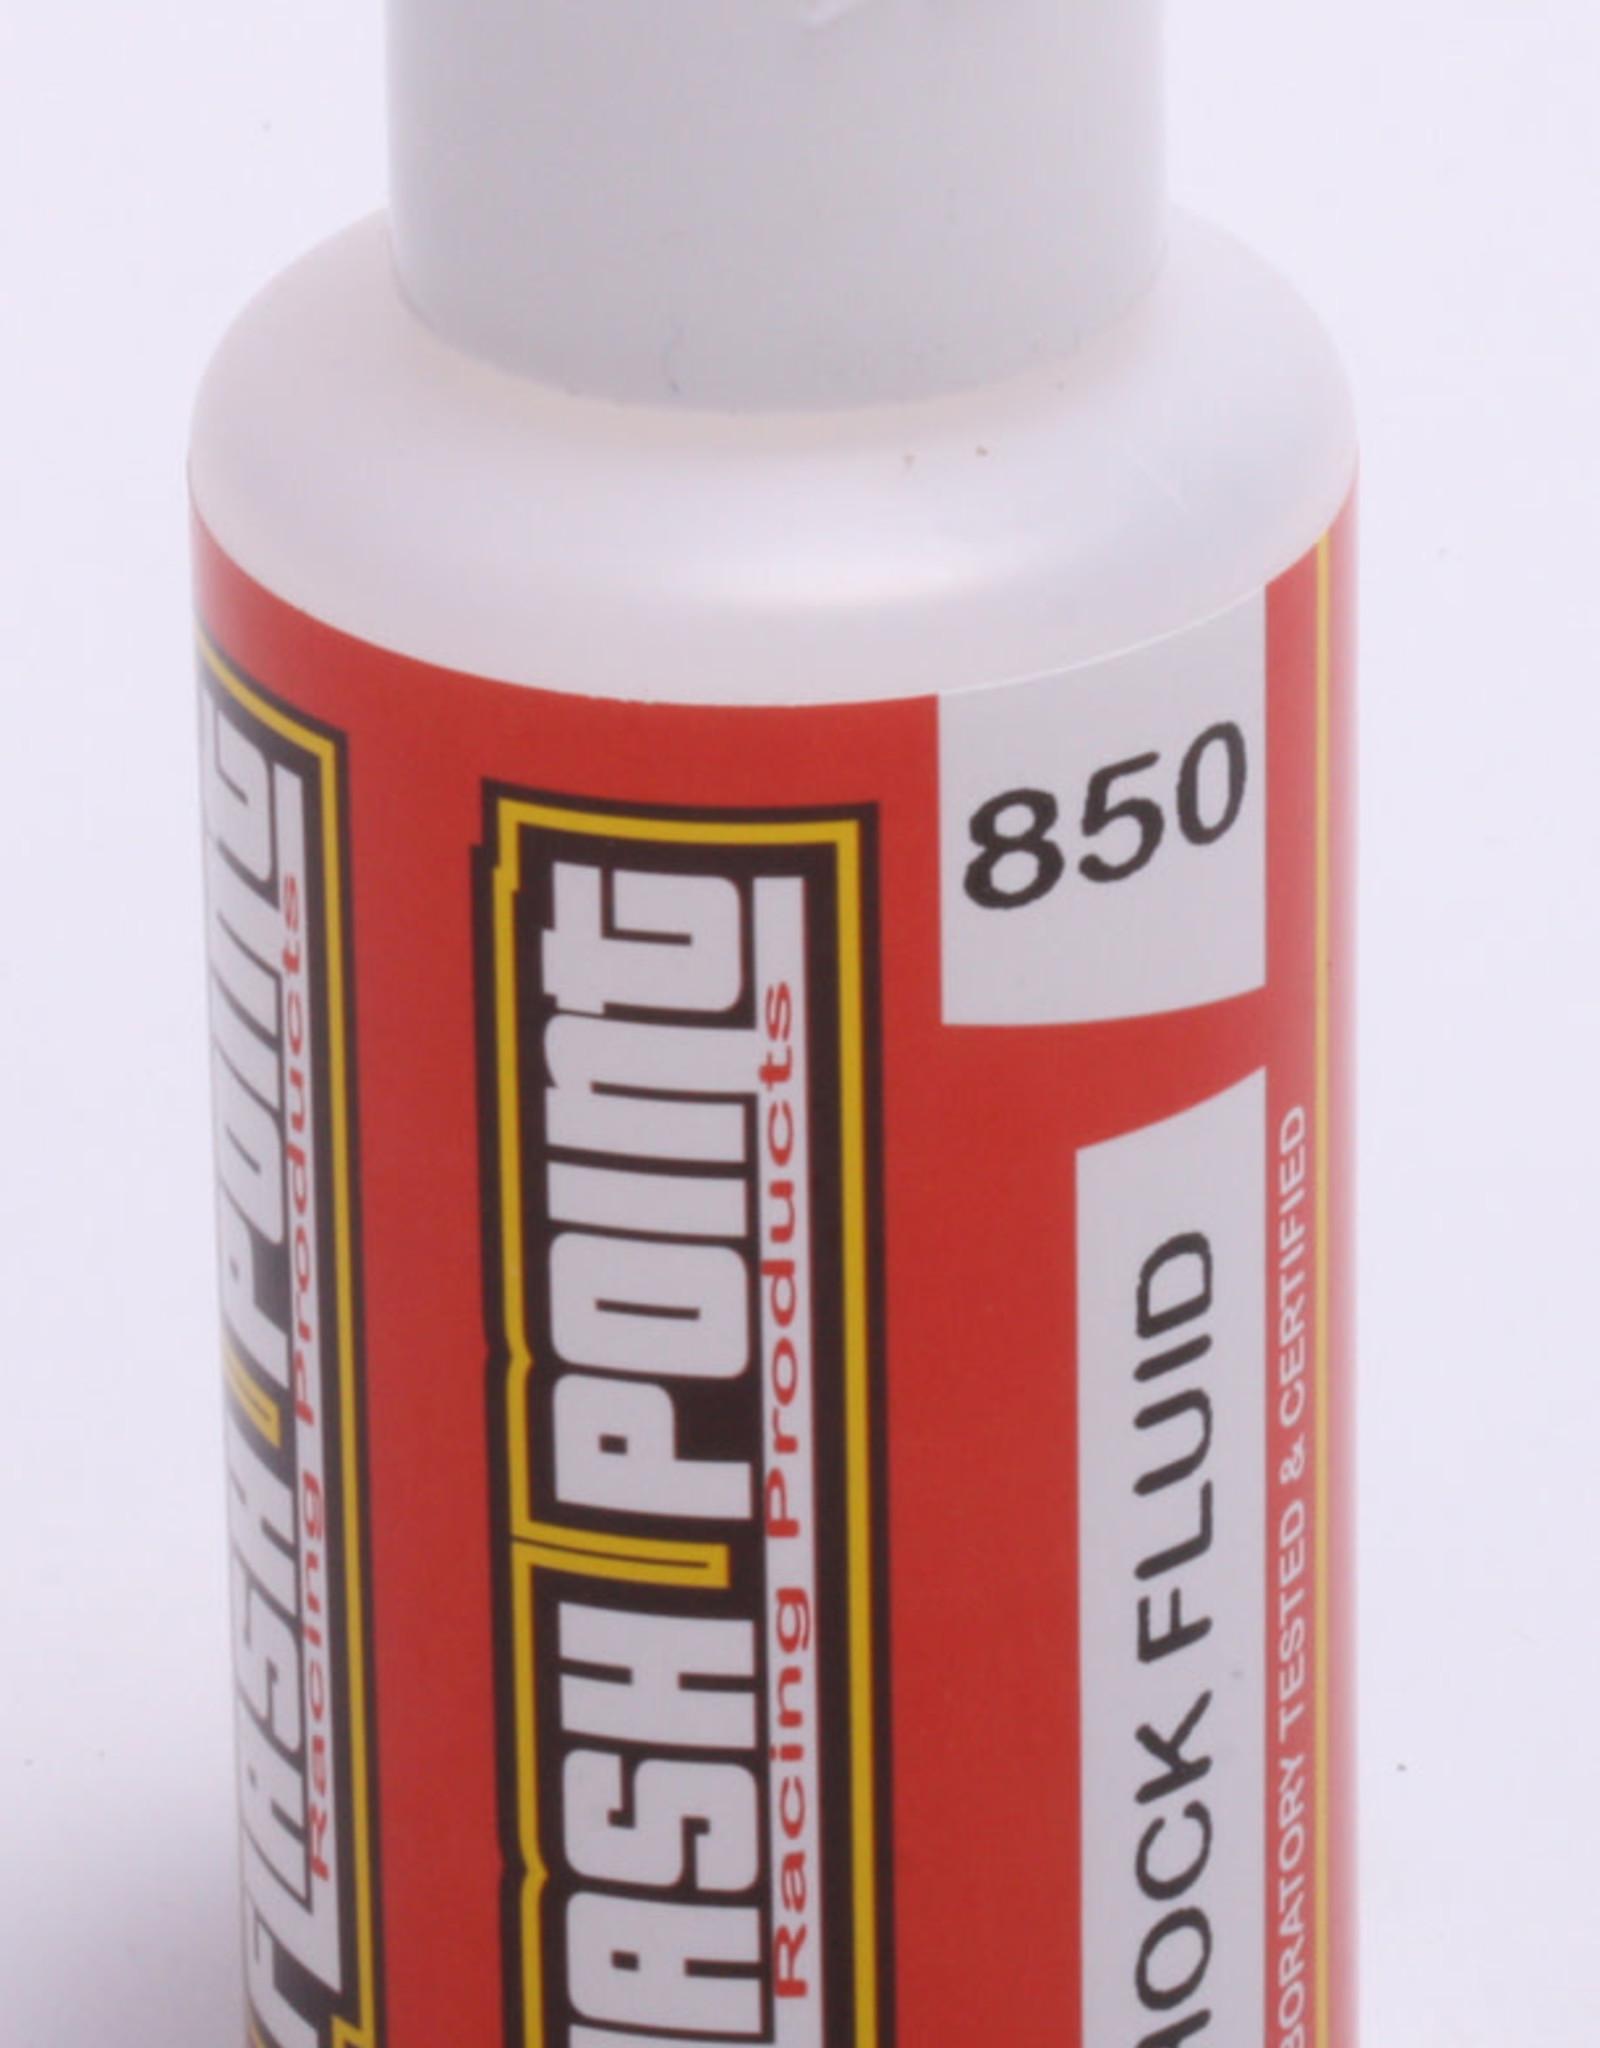 Flash Point Flash Point silicon oil 850